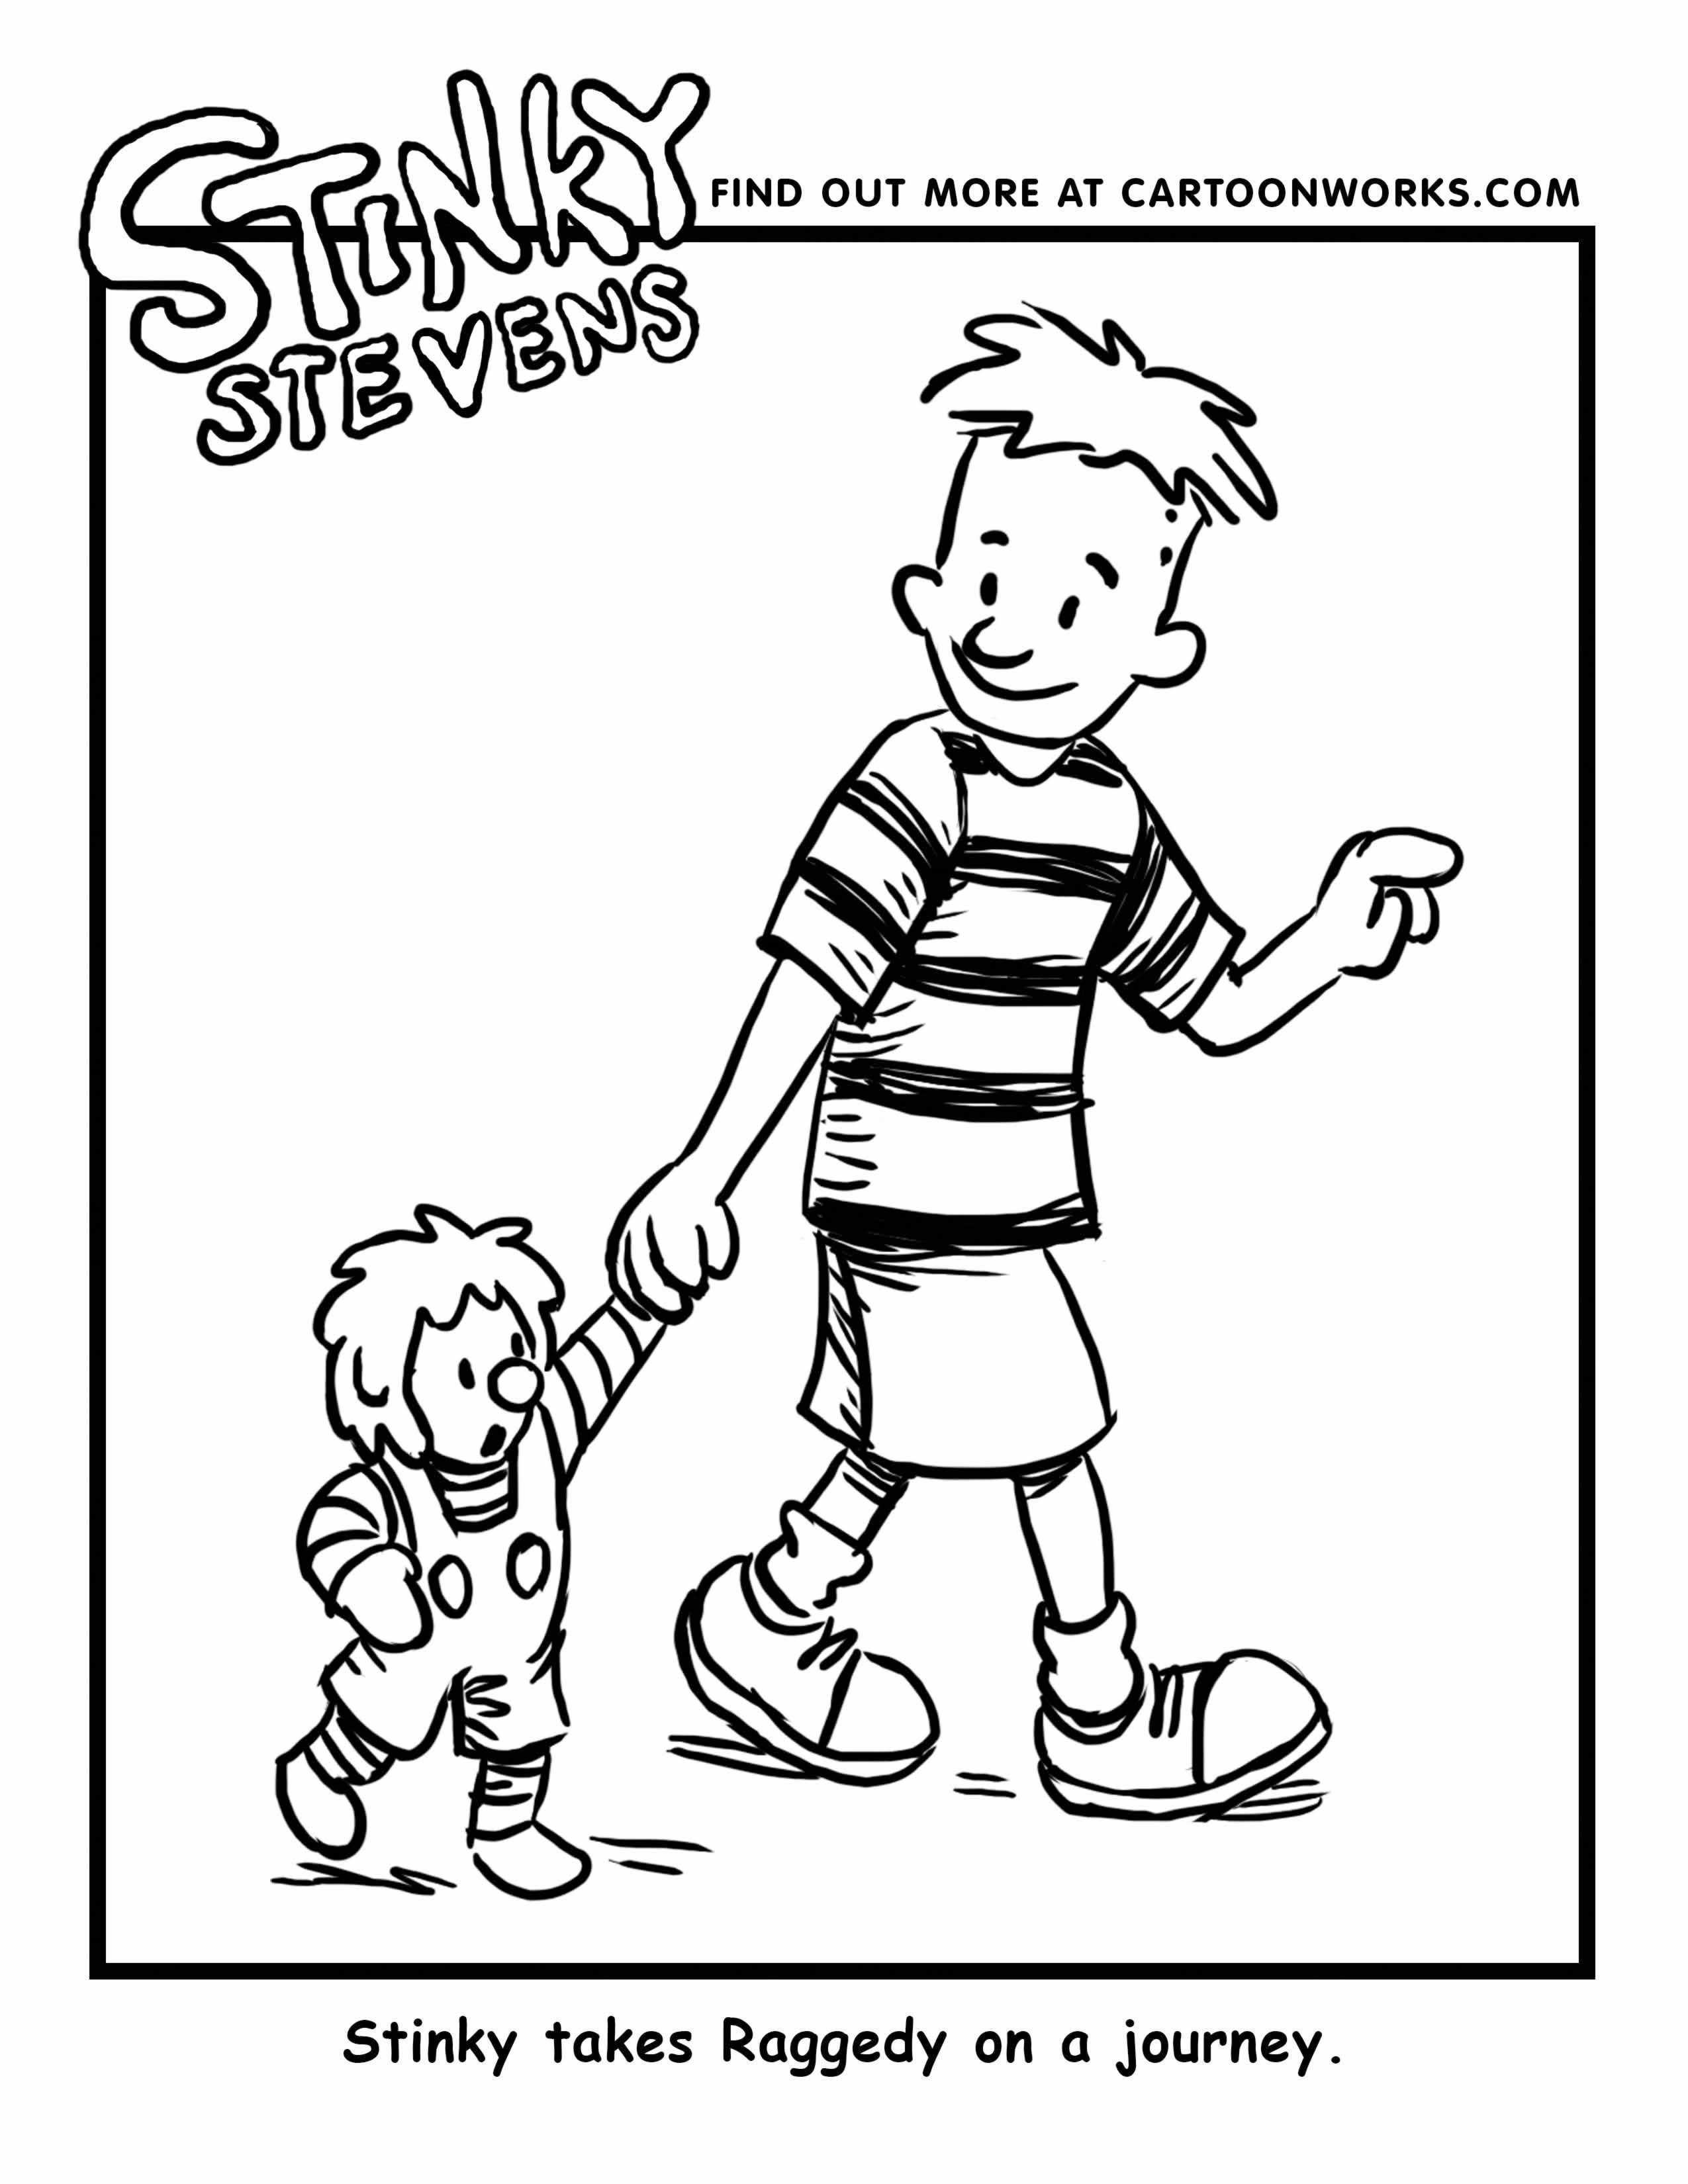 2550x3300 Stinky Stevens Official Website Home